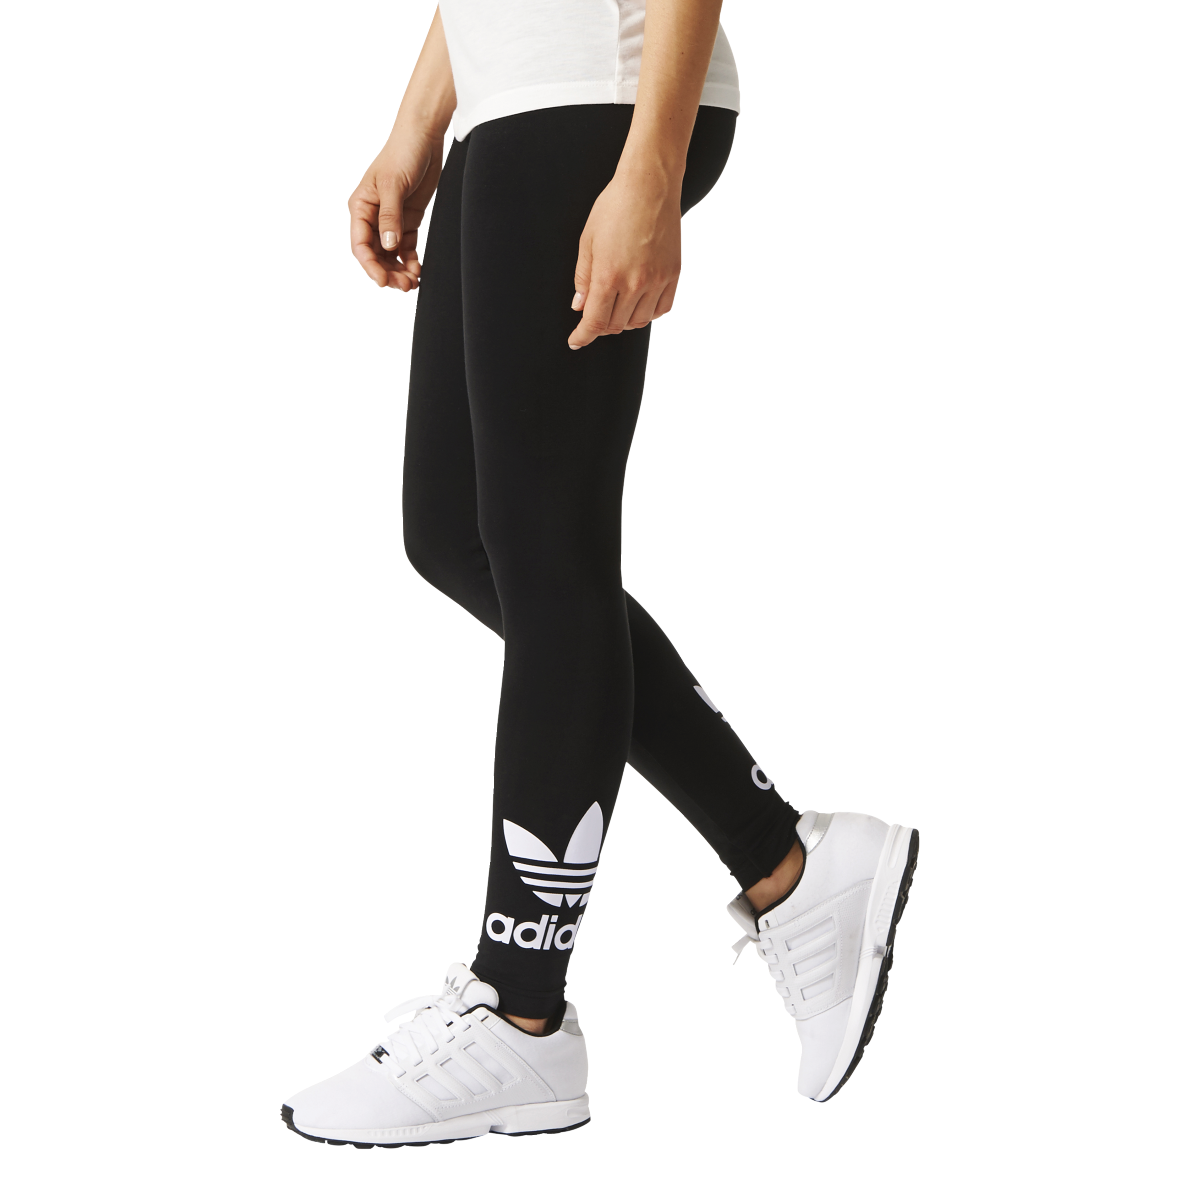 adidas originals trefoil leggings damen schwarz aj8153 sport klingenmaier. Black Bedroom Furniture Sets. Home Design Ideas